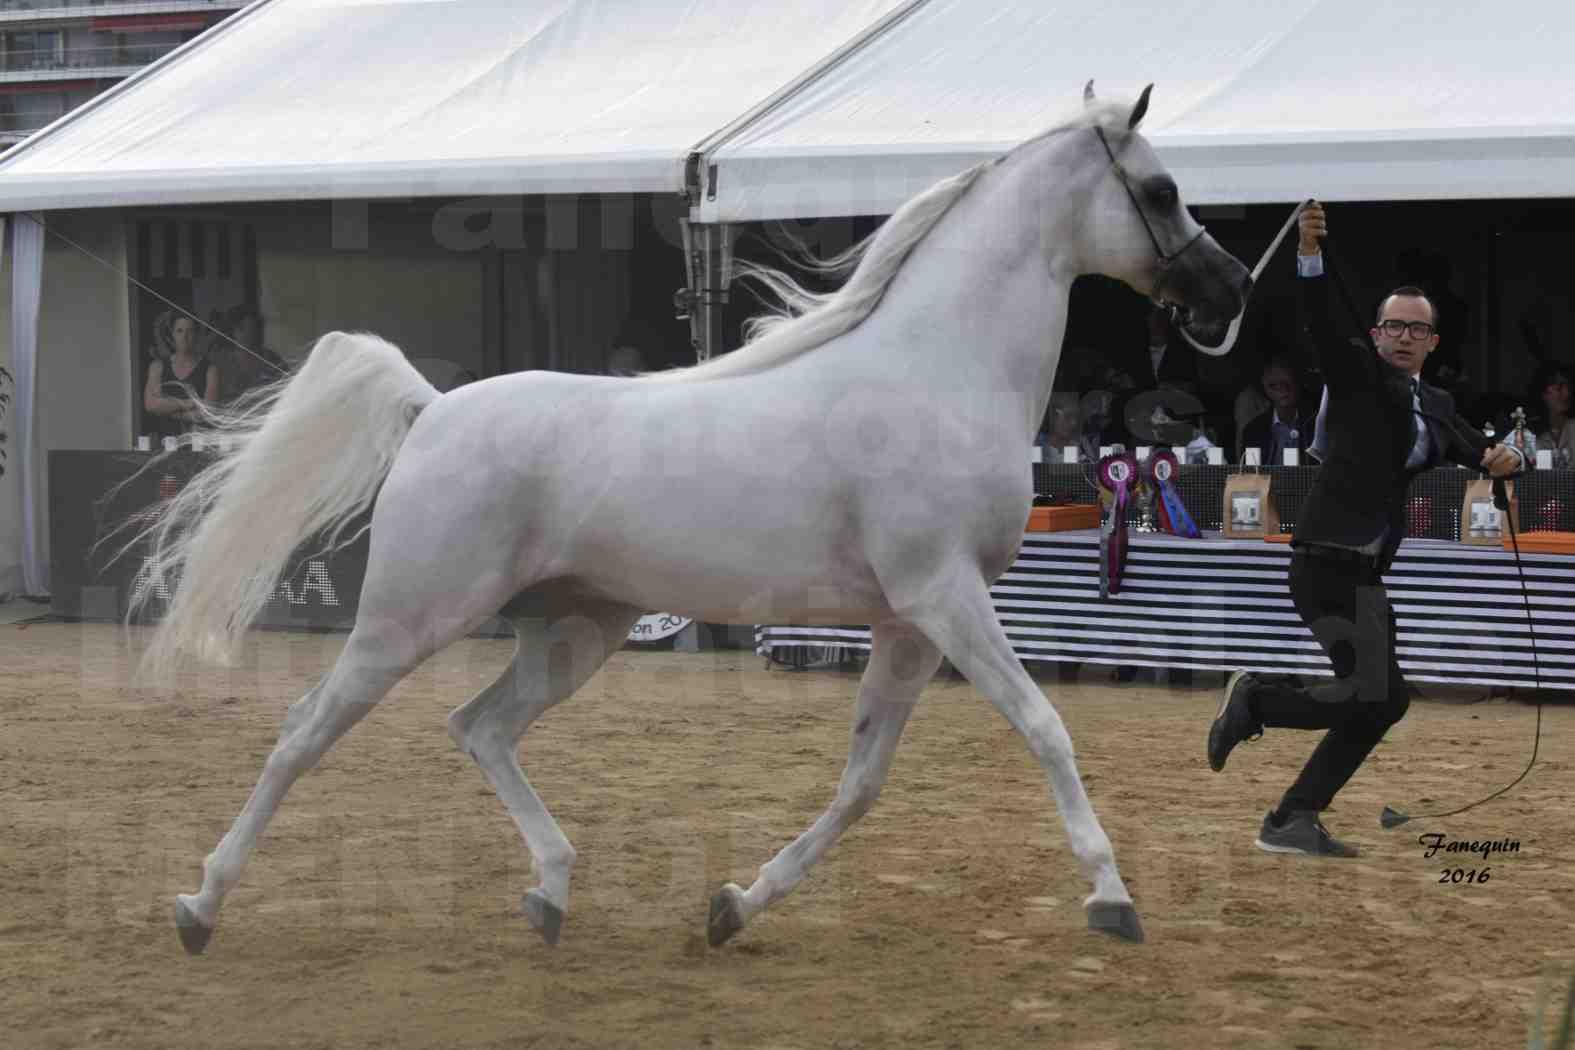 Show International de chevaux ARABES de MENTON 2016 - AJA ANGELO - 09